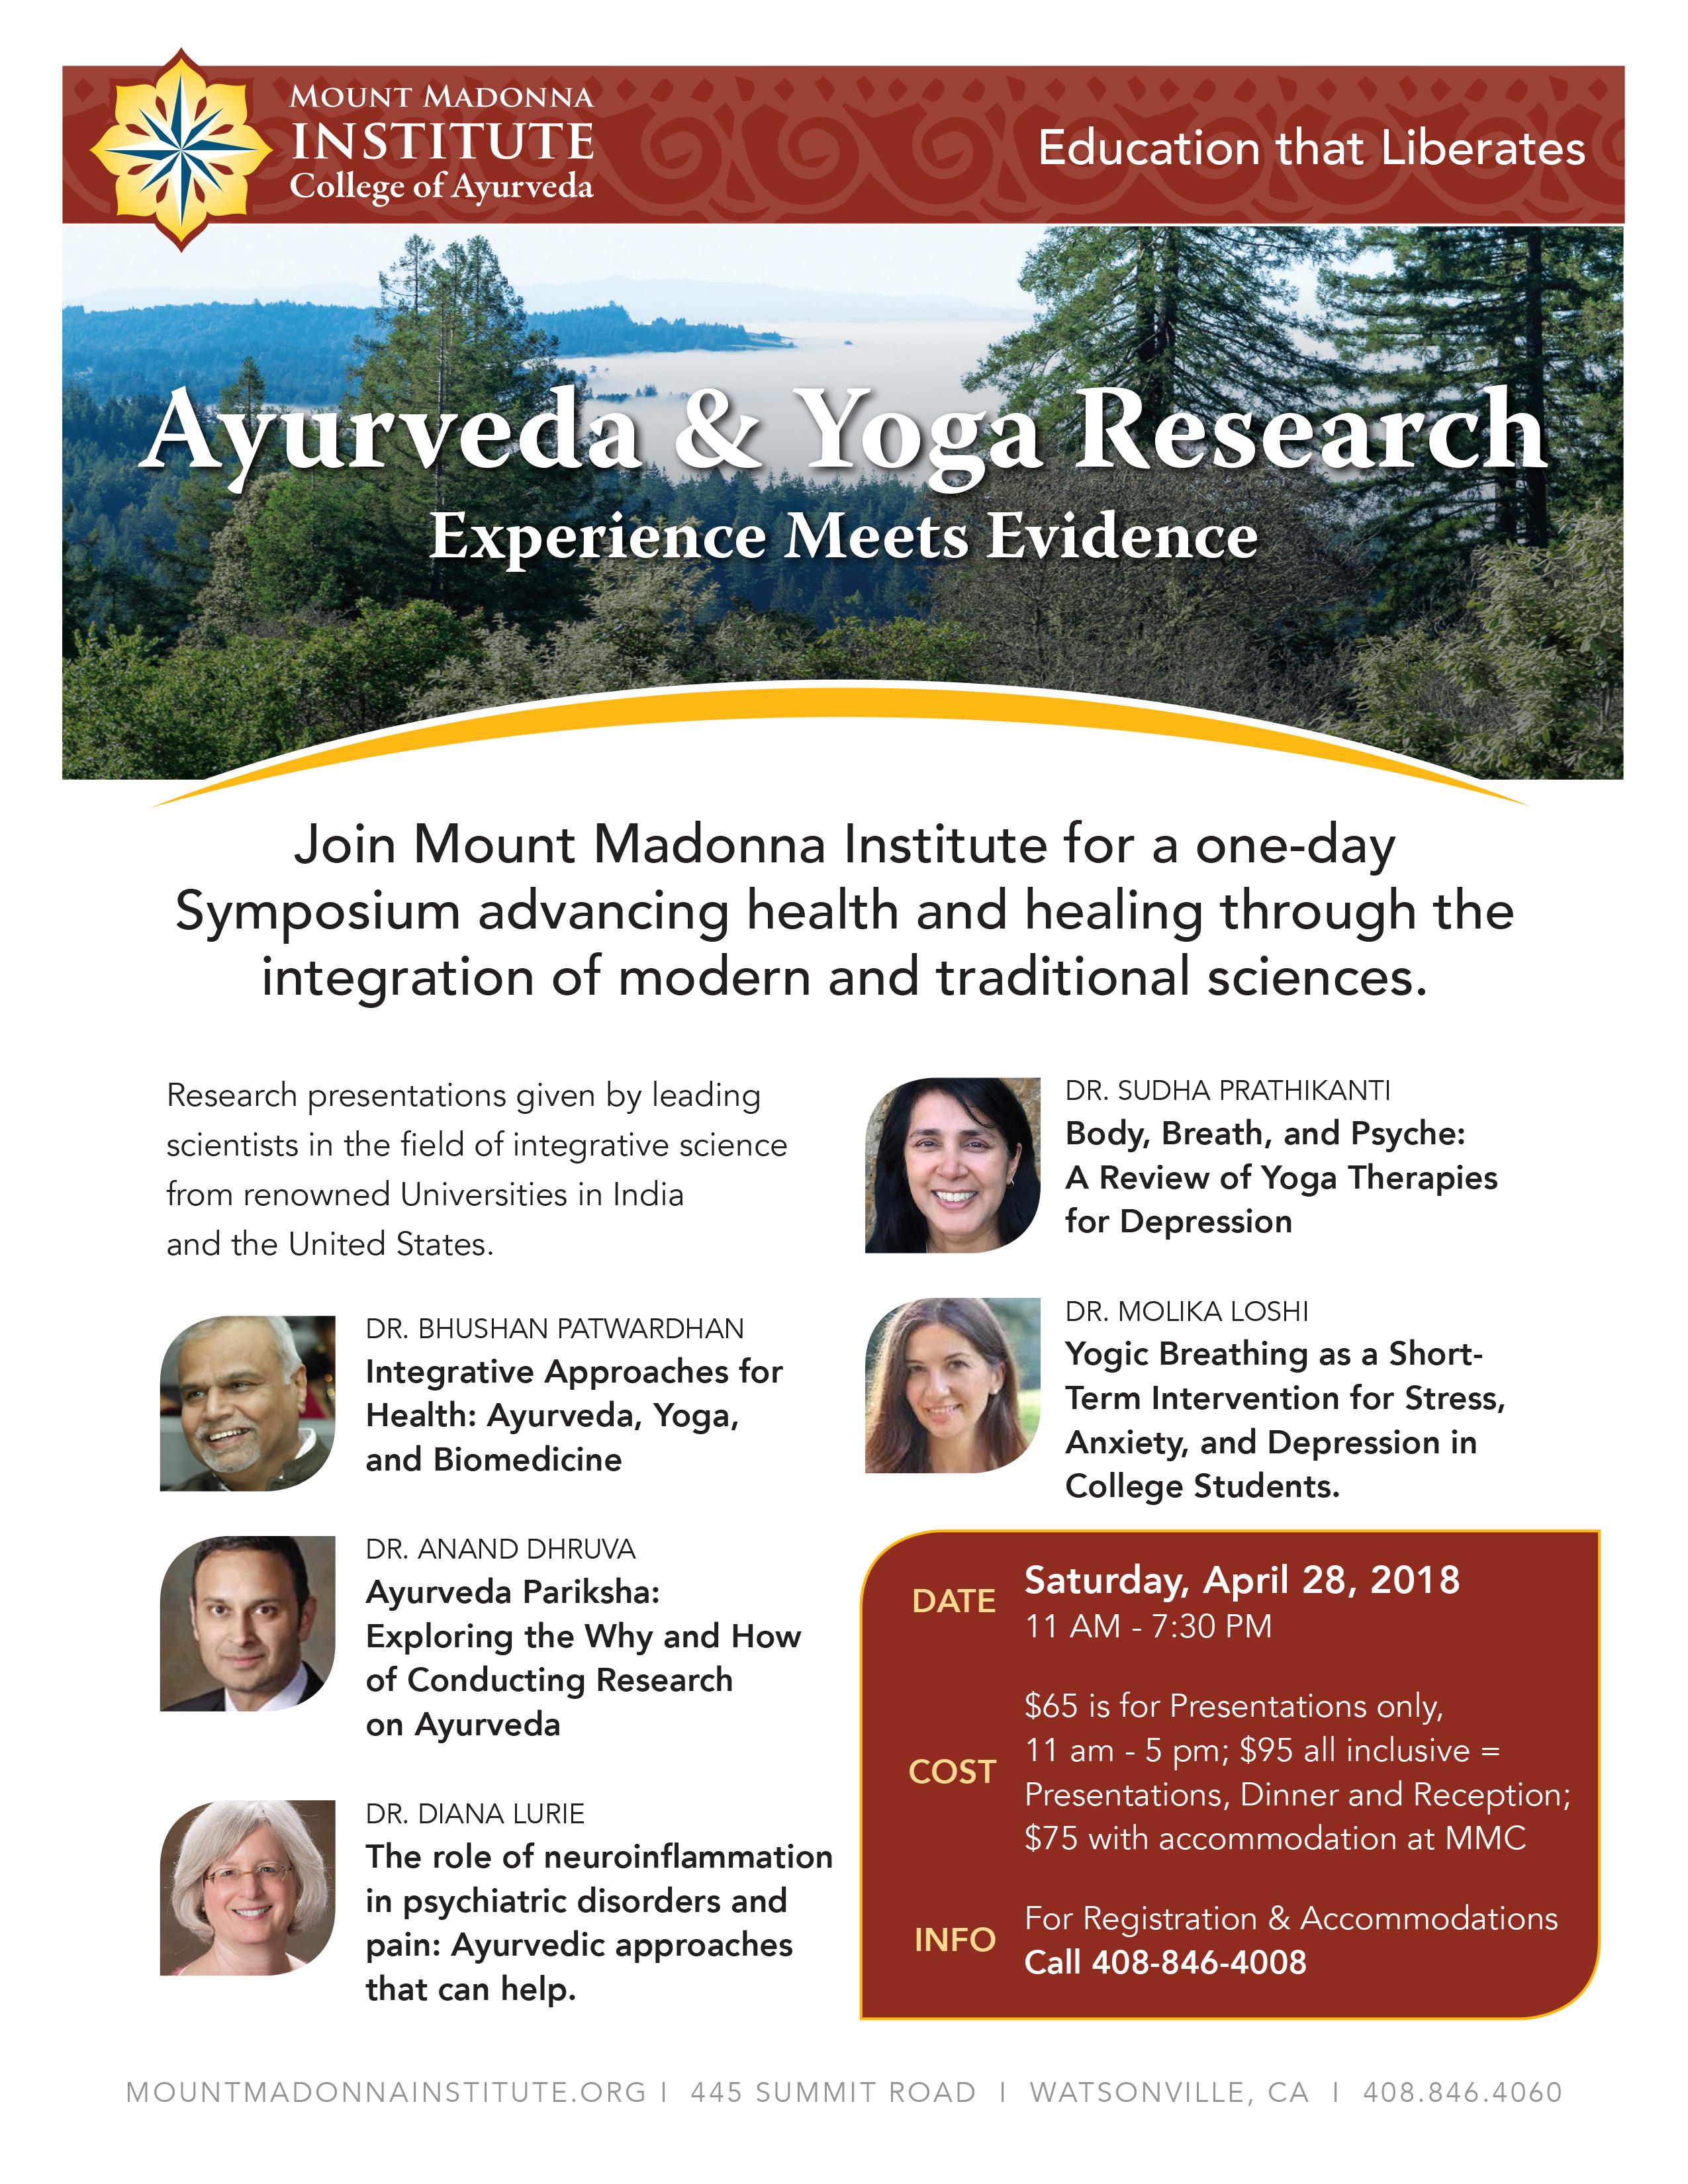 Research Center - Mount Madonna Institute